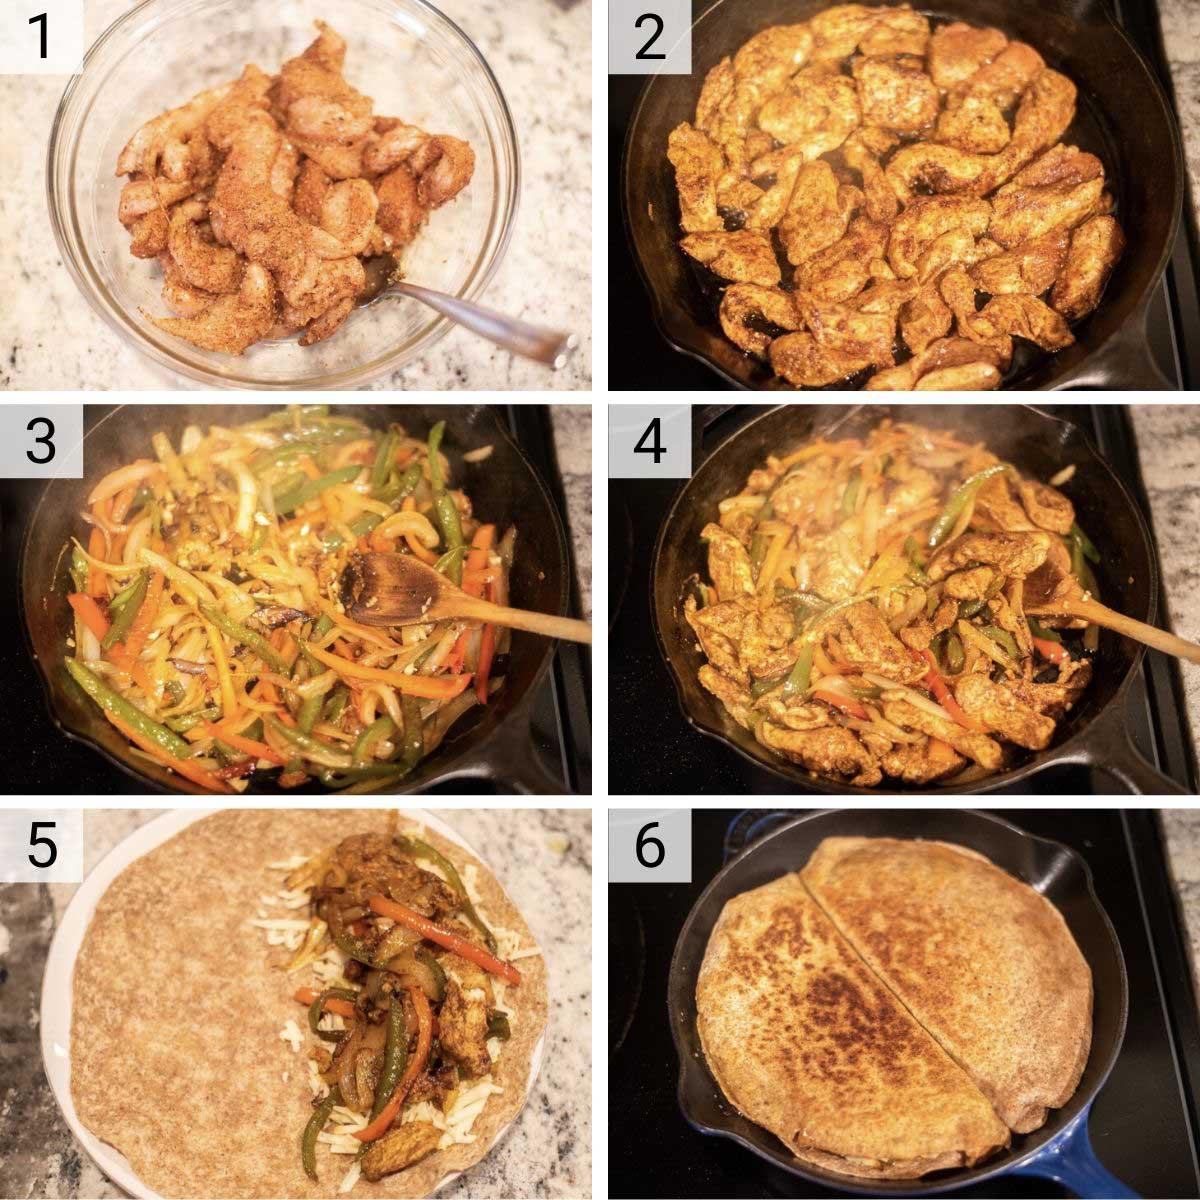 process shots of how to make chicken fajita quesadillas